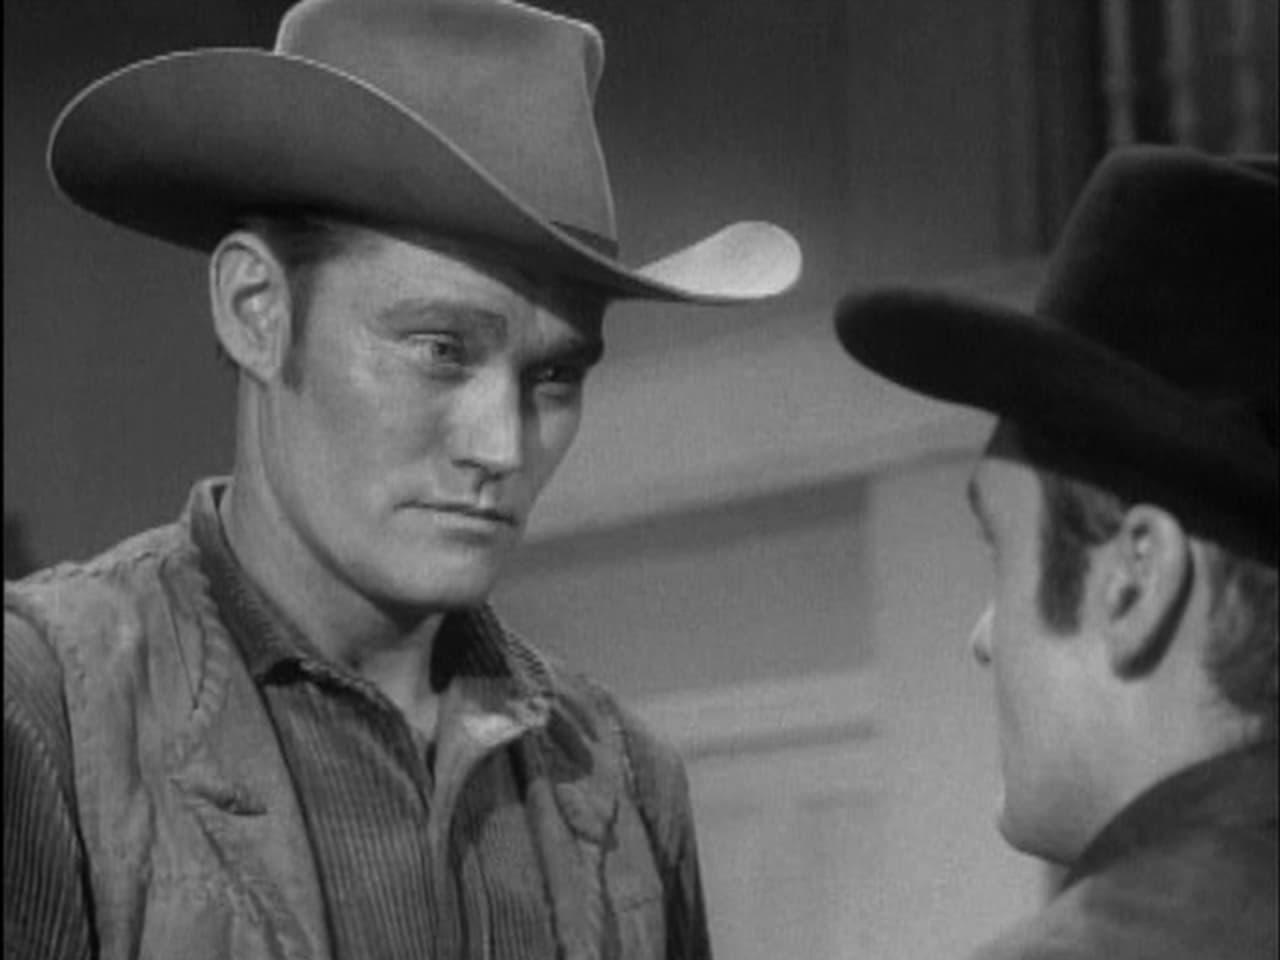 The Rifleman - Season 1 Episode 1 : The Sharpshooter (1963)